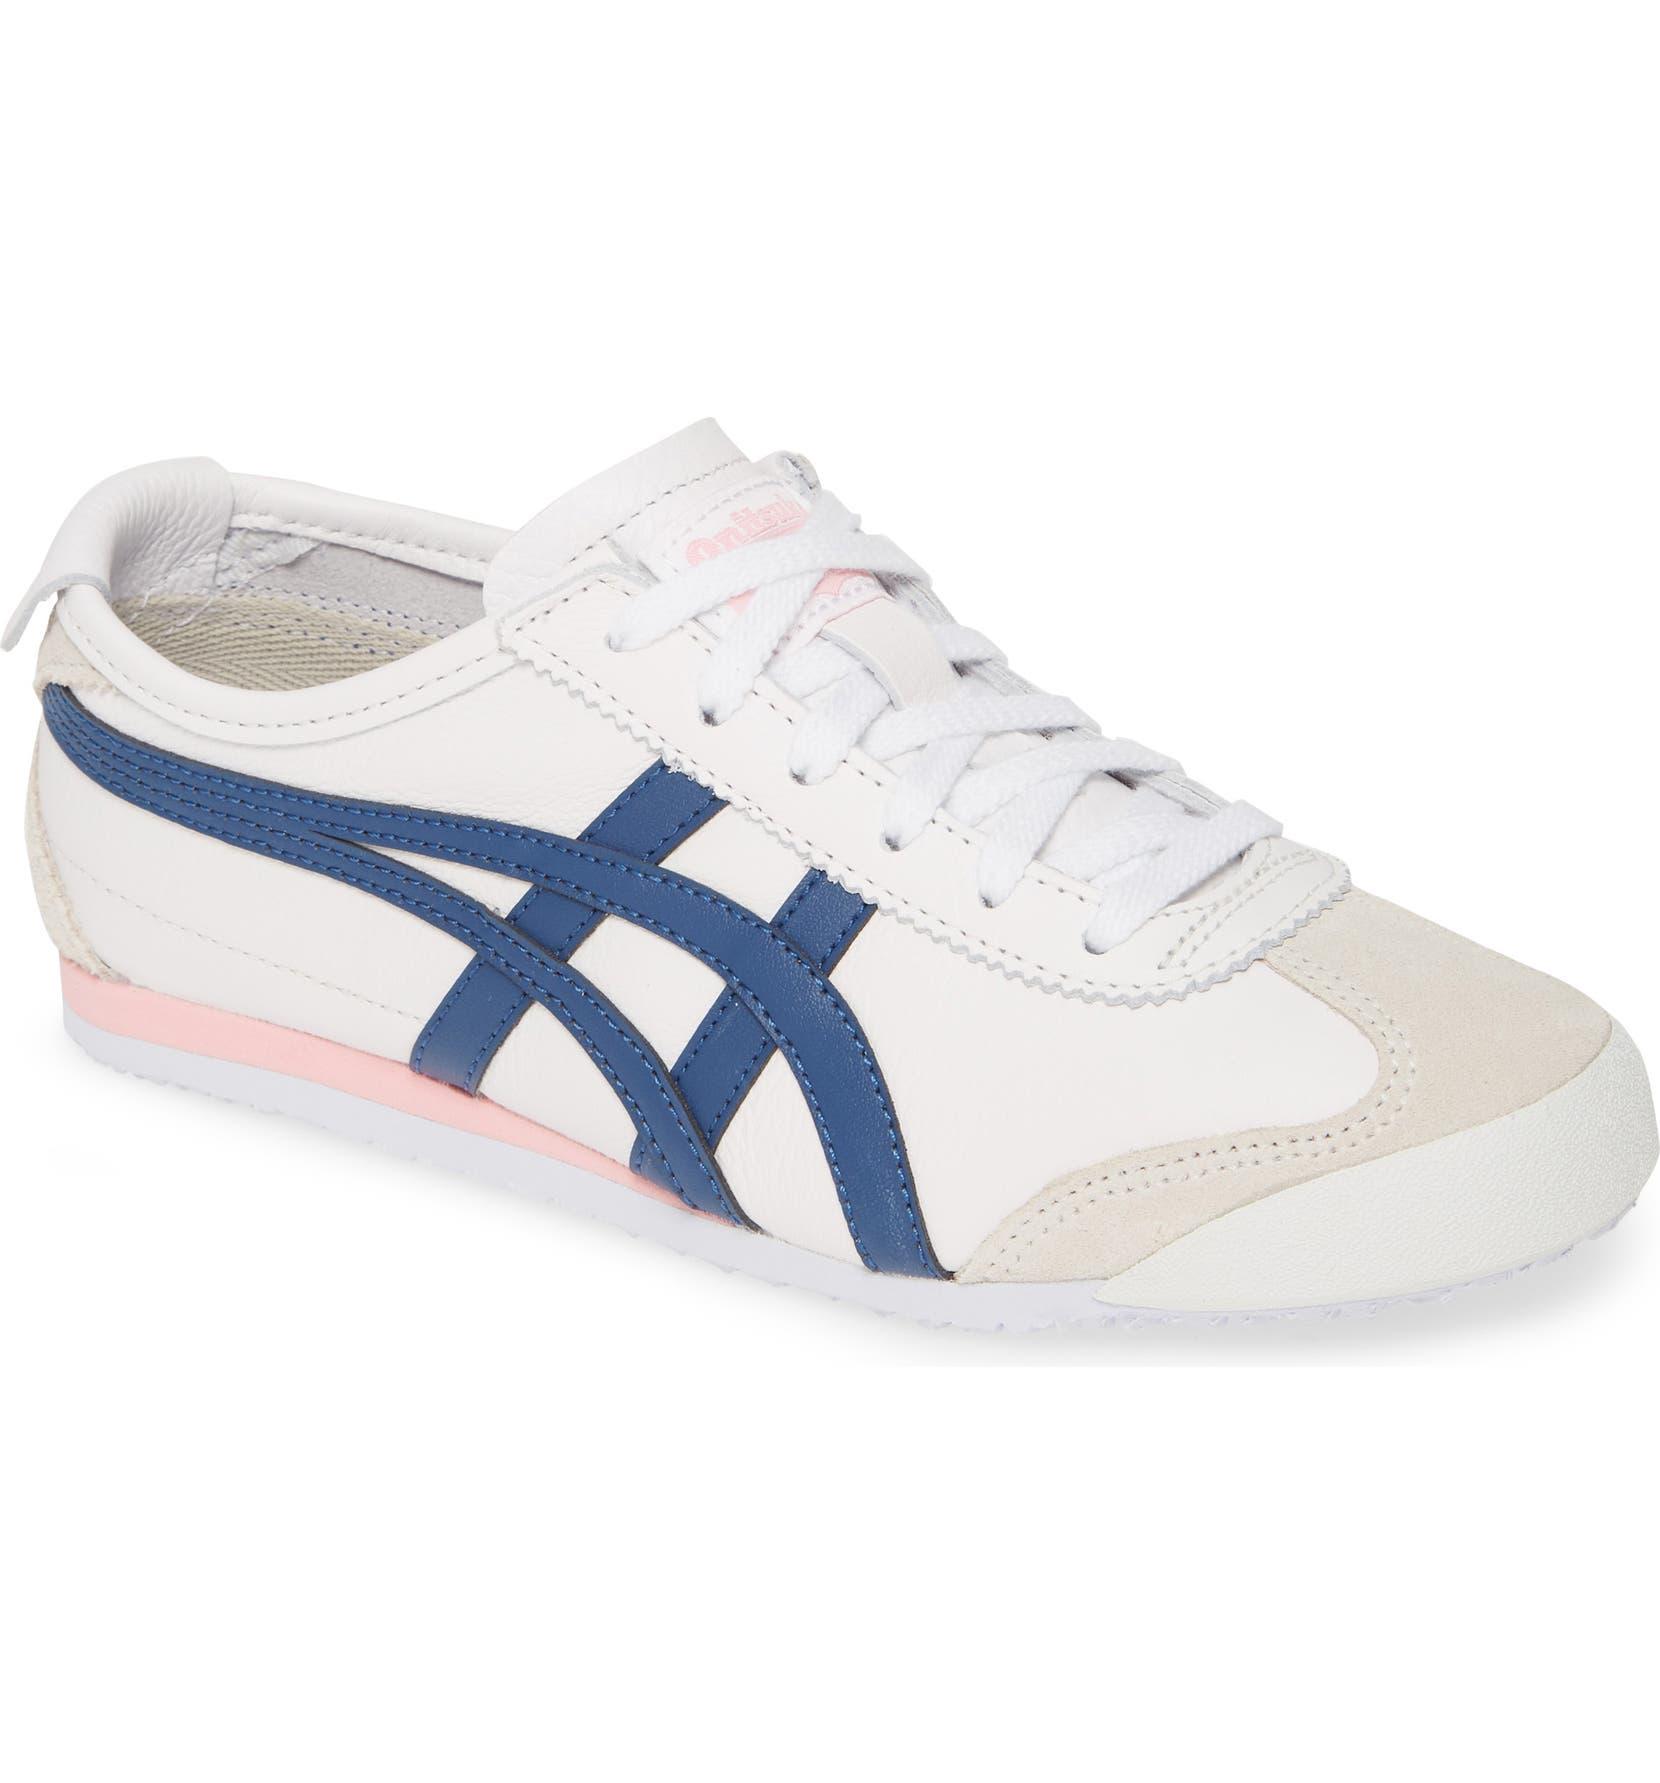 san francisco 1c531 baf33 ASICS® Onitsuka Tiger Mexico 66 Low Top Sneaker